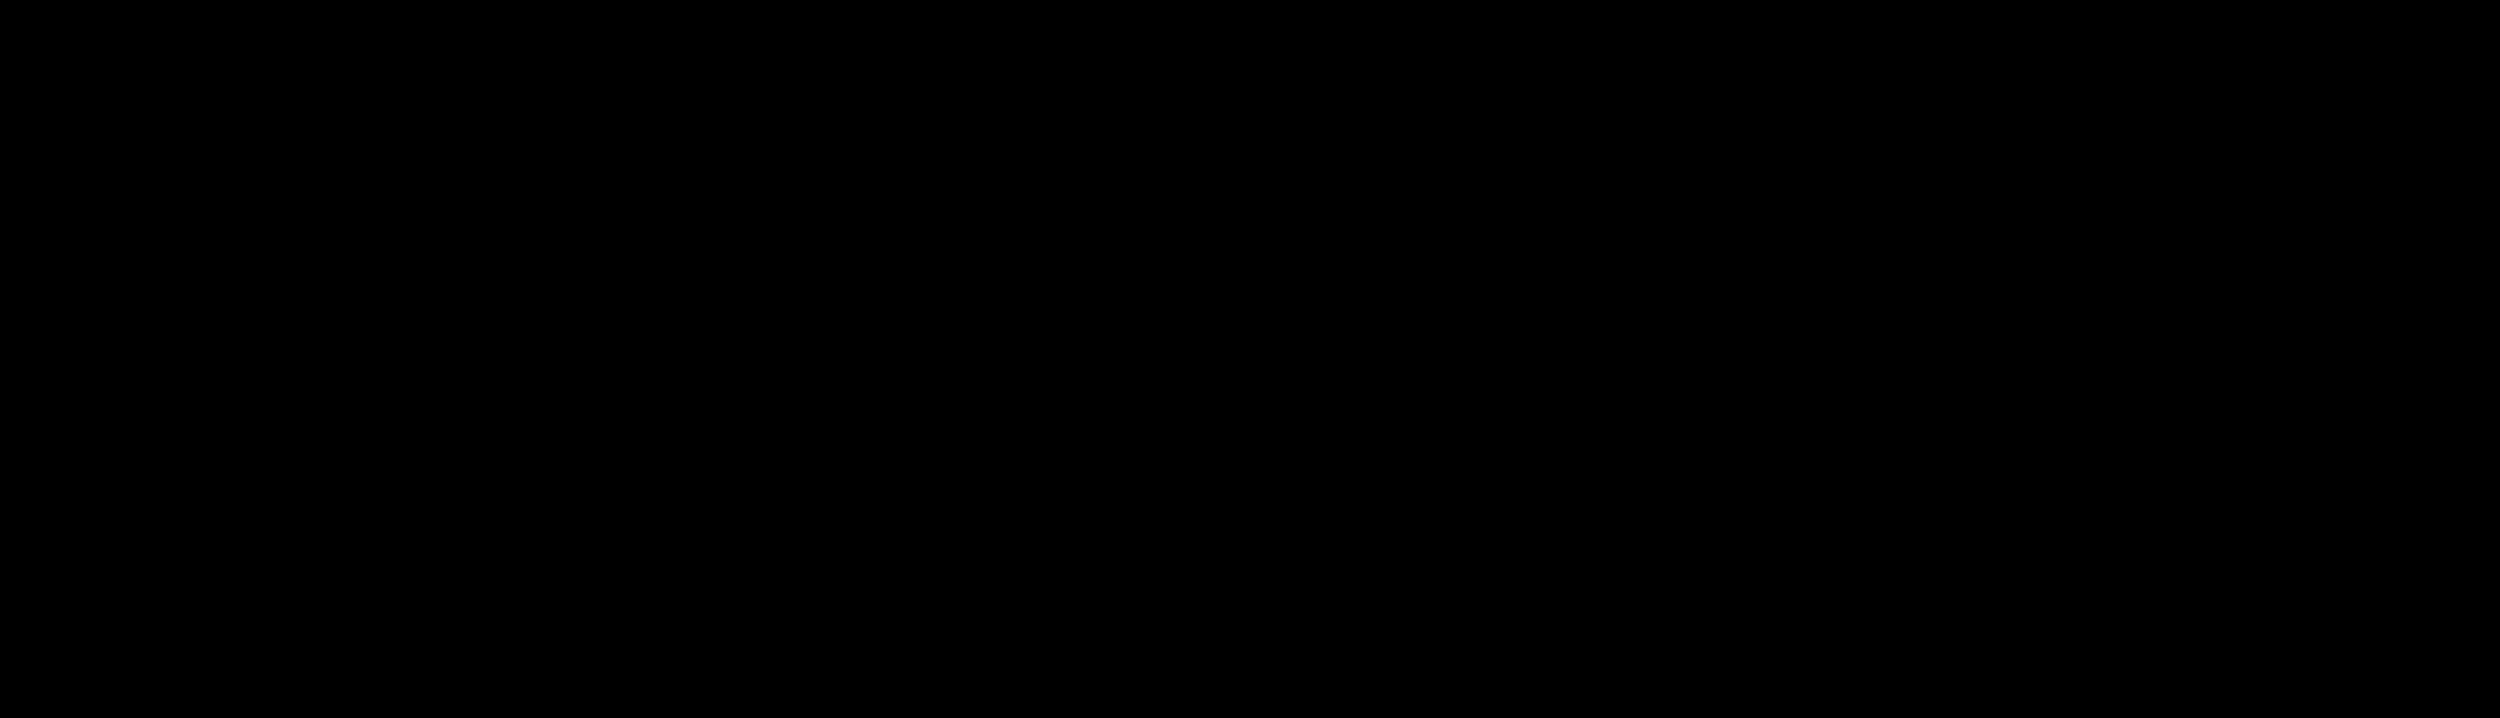 DiceEnvy Banner.png